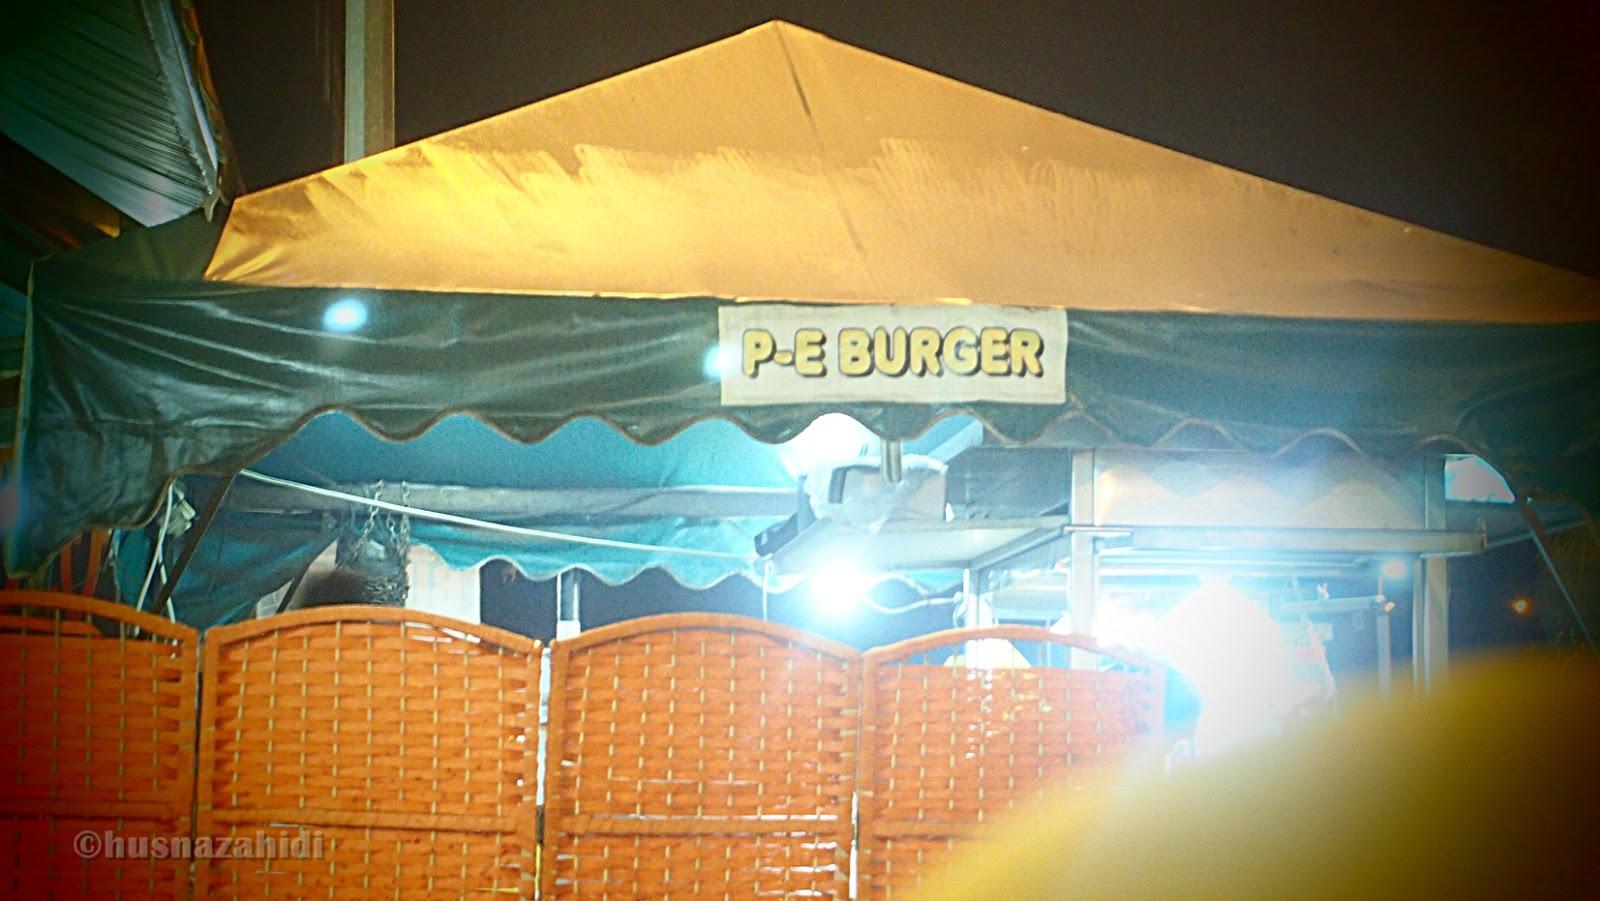 P-E Burger, Alor Setar